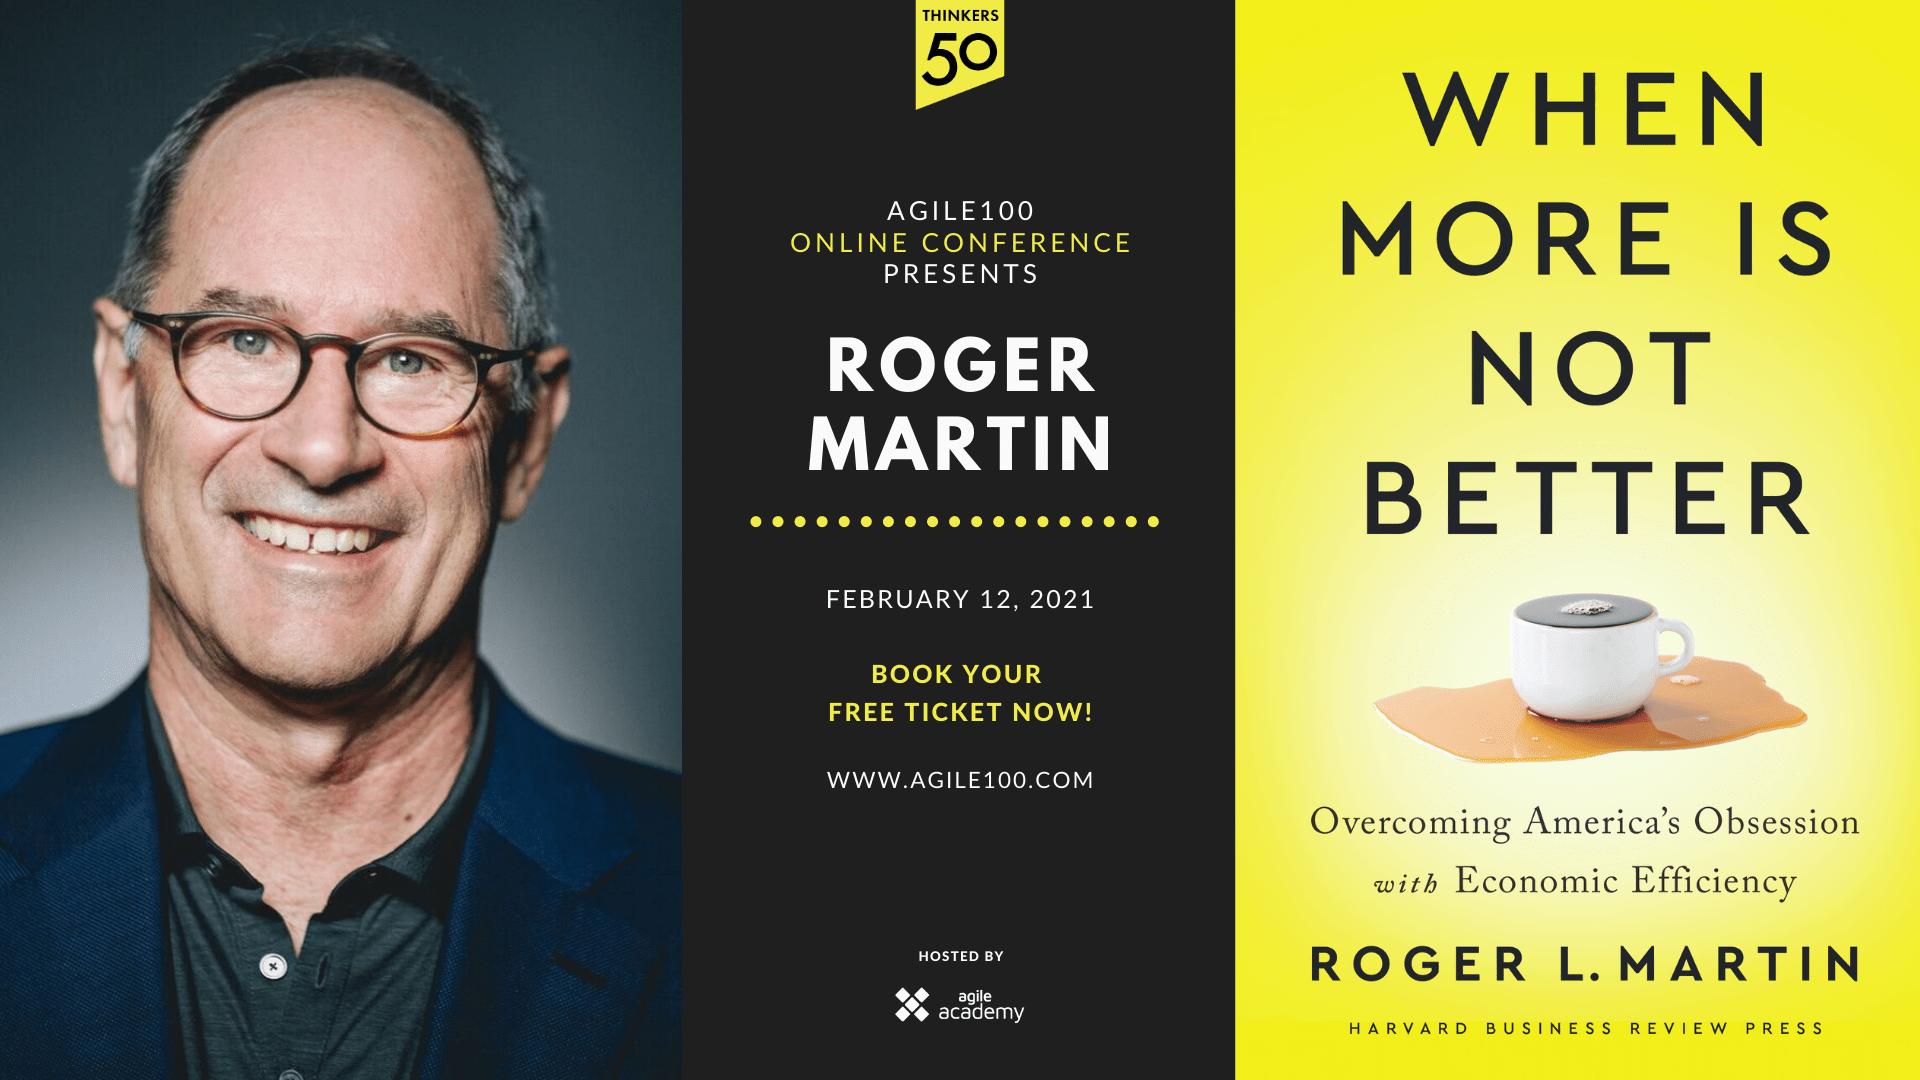 When more is not Better (Buch von Roger L. Martin)